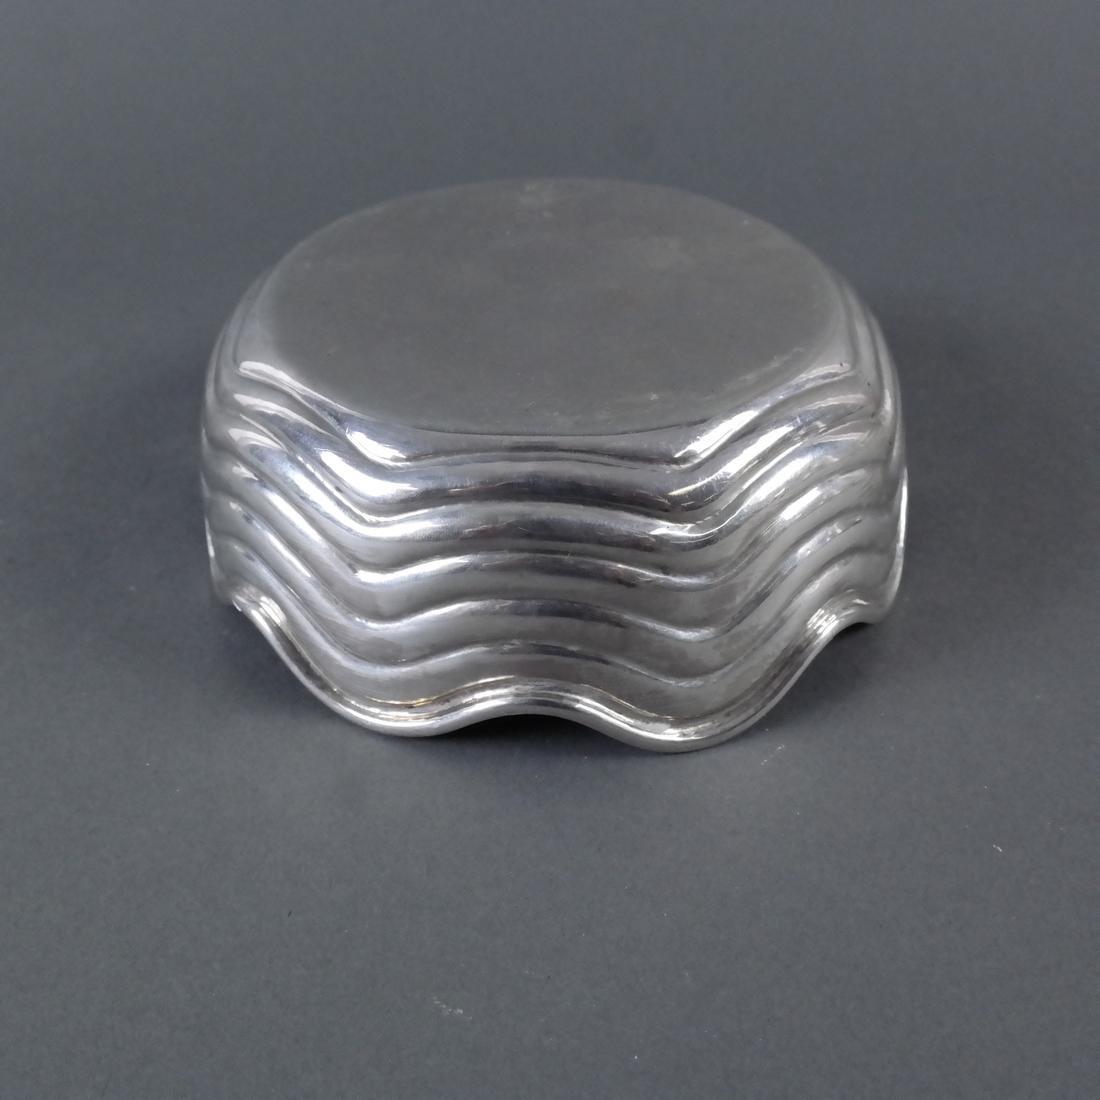 .900 Standard Silver Wave-Form Bowl - 4